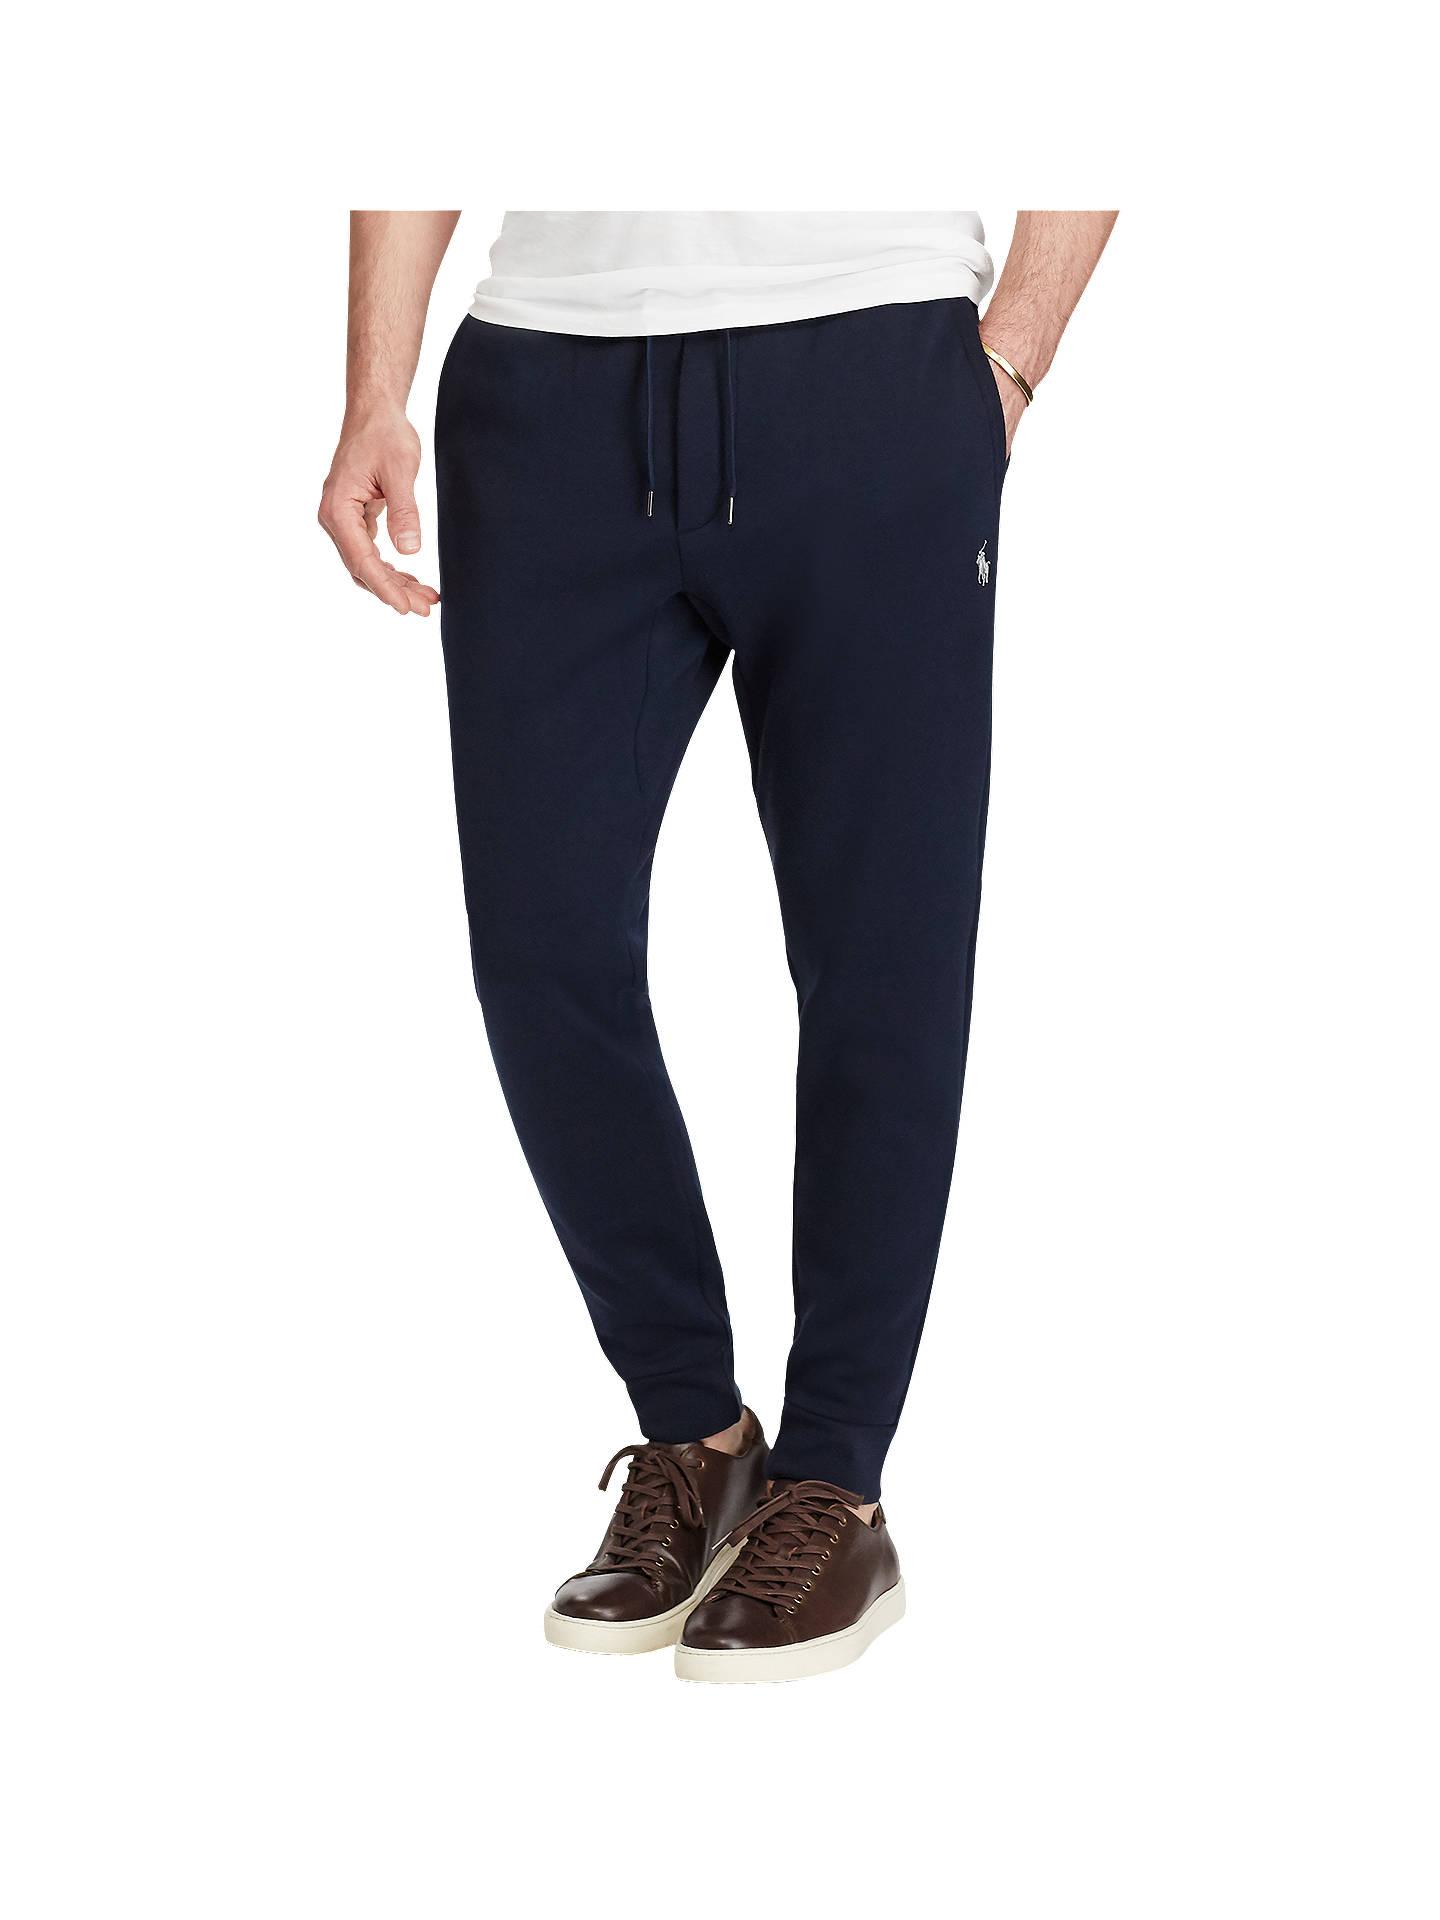 53ab71eeb1524 Buy Polo Ralph Lauren Double-Knit Jogging Bottoms, Aviator Navy, S Online  at ...